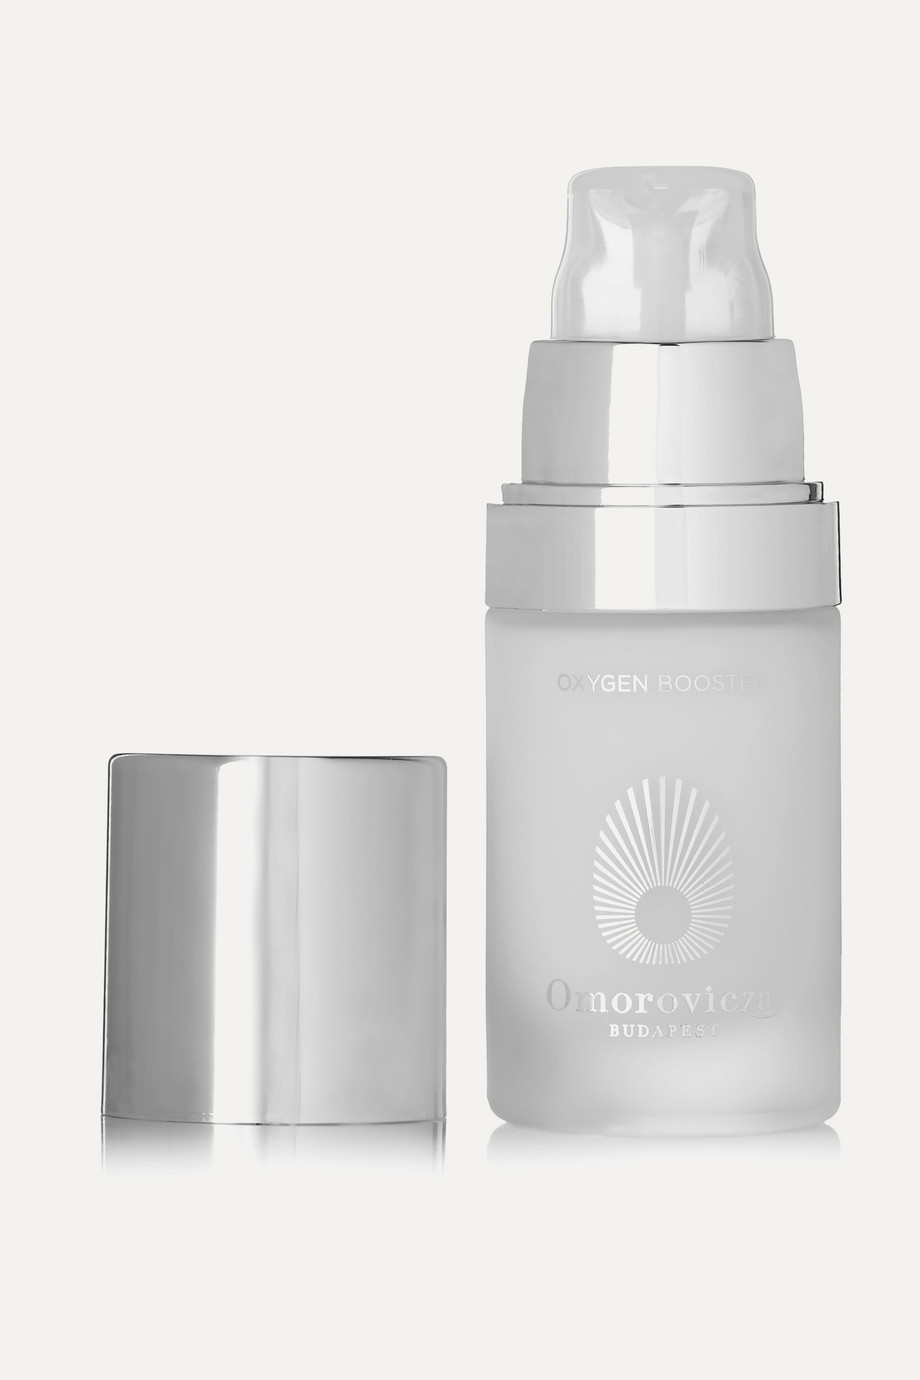 Omorovicza Oxygen Booster, 15ml